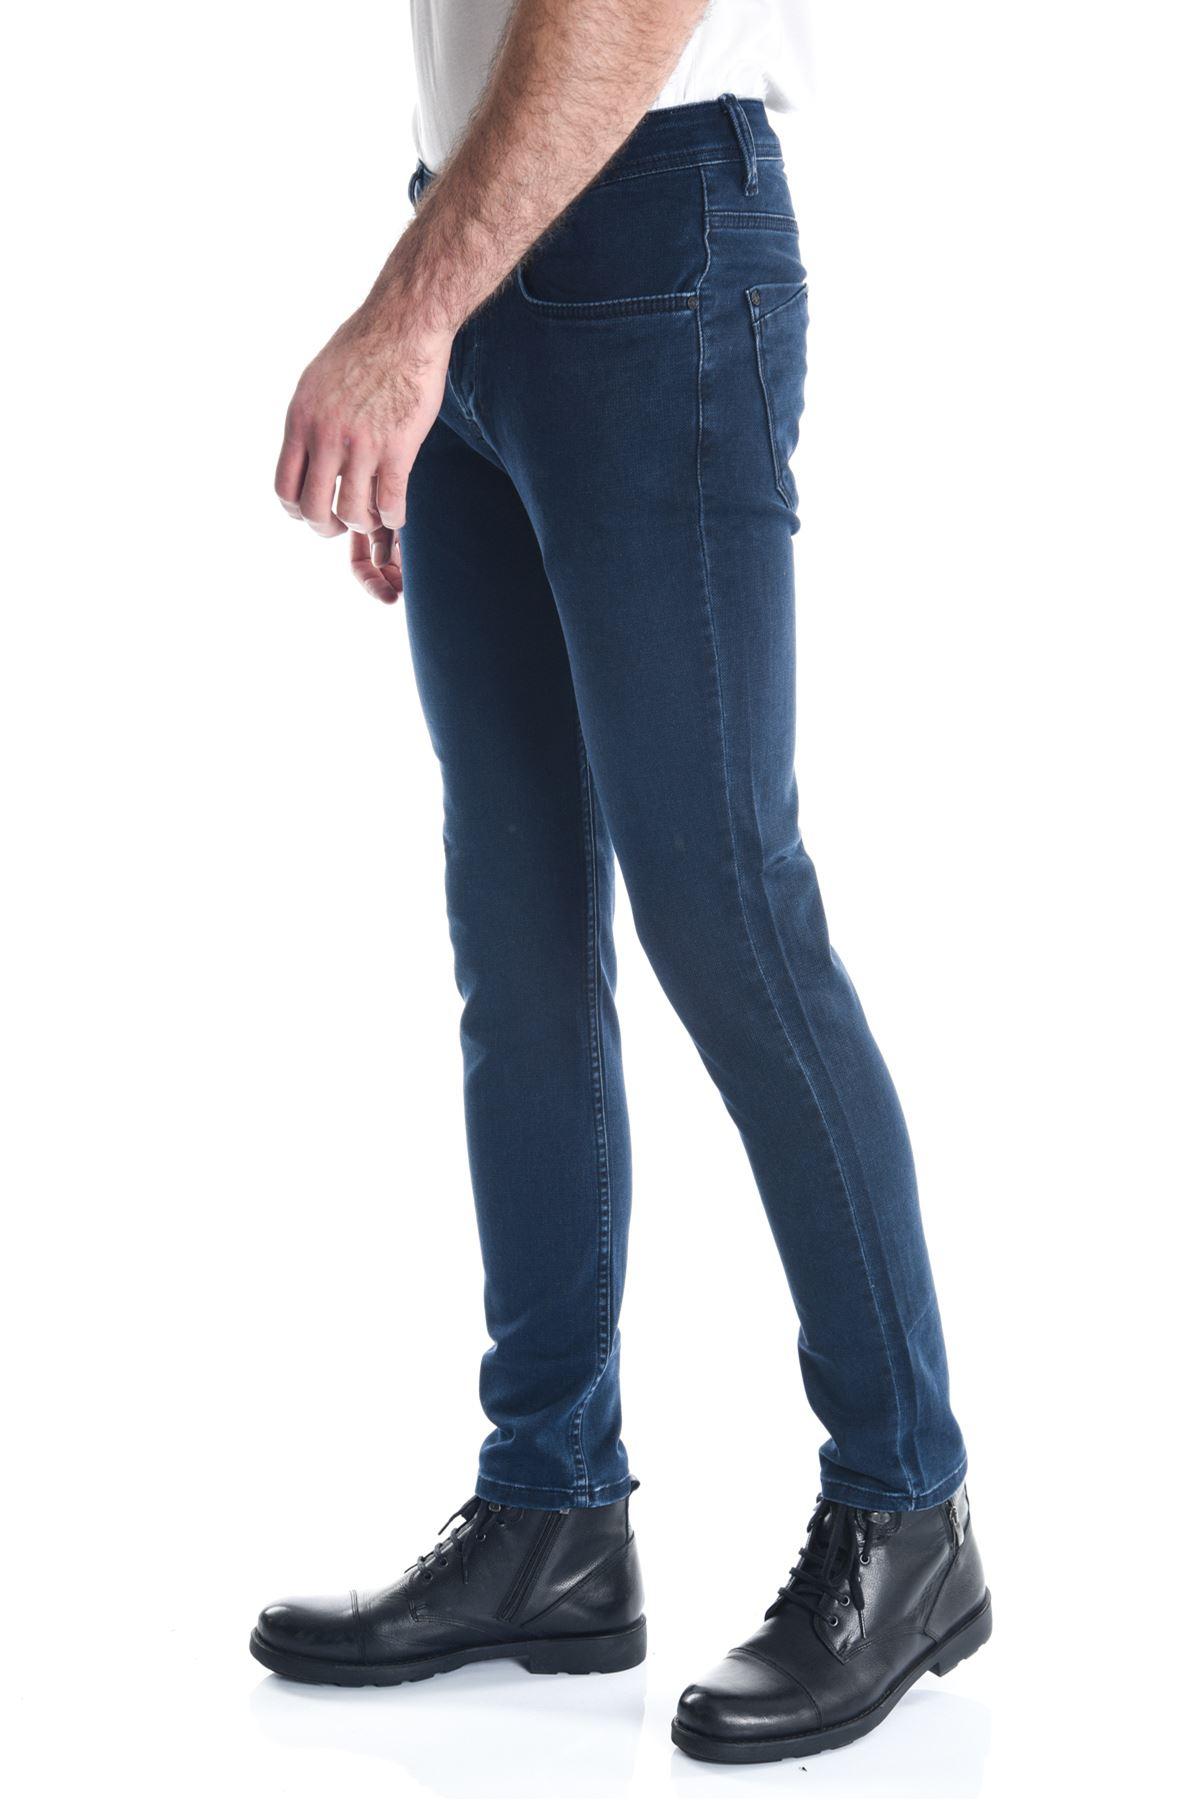 Lacivert Sade Armürlü Yeni Slimfit Erkek Kot Pantolon